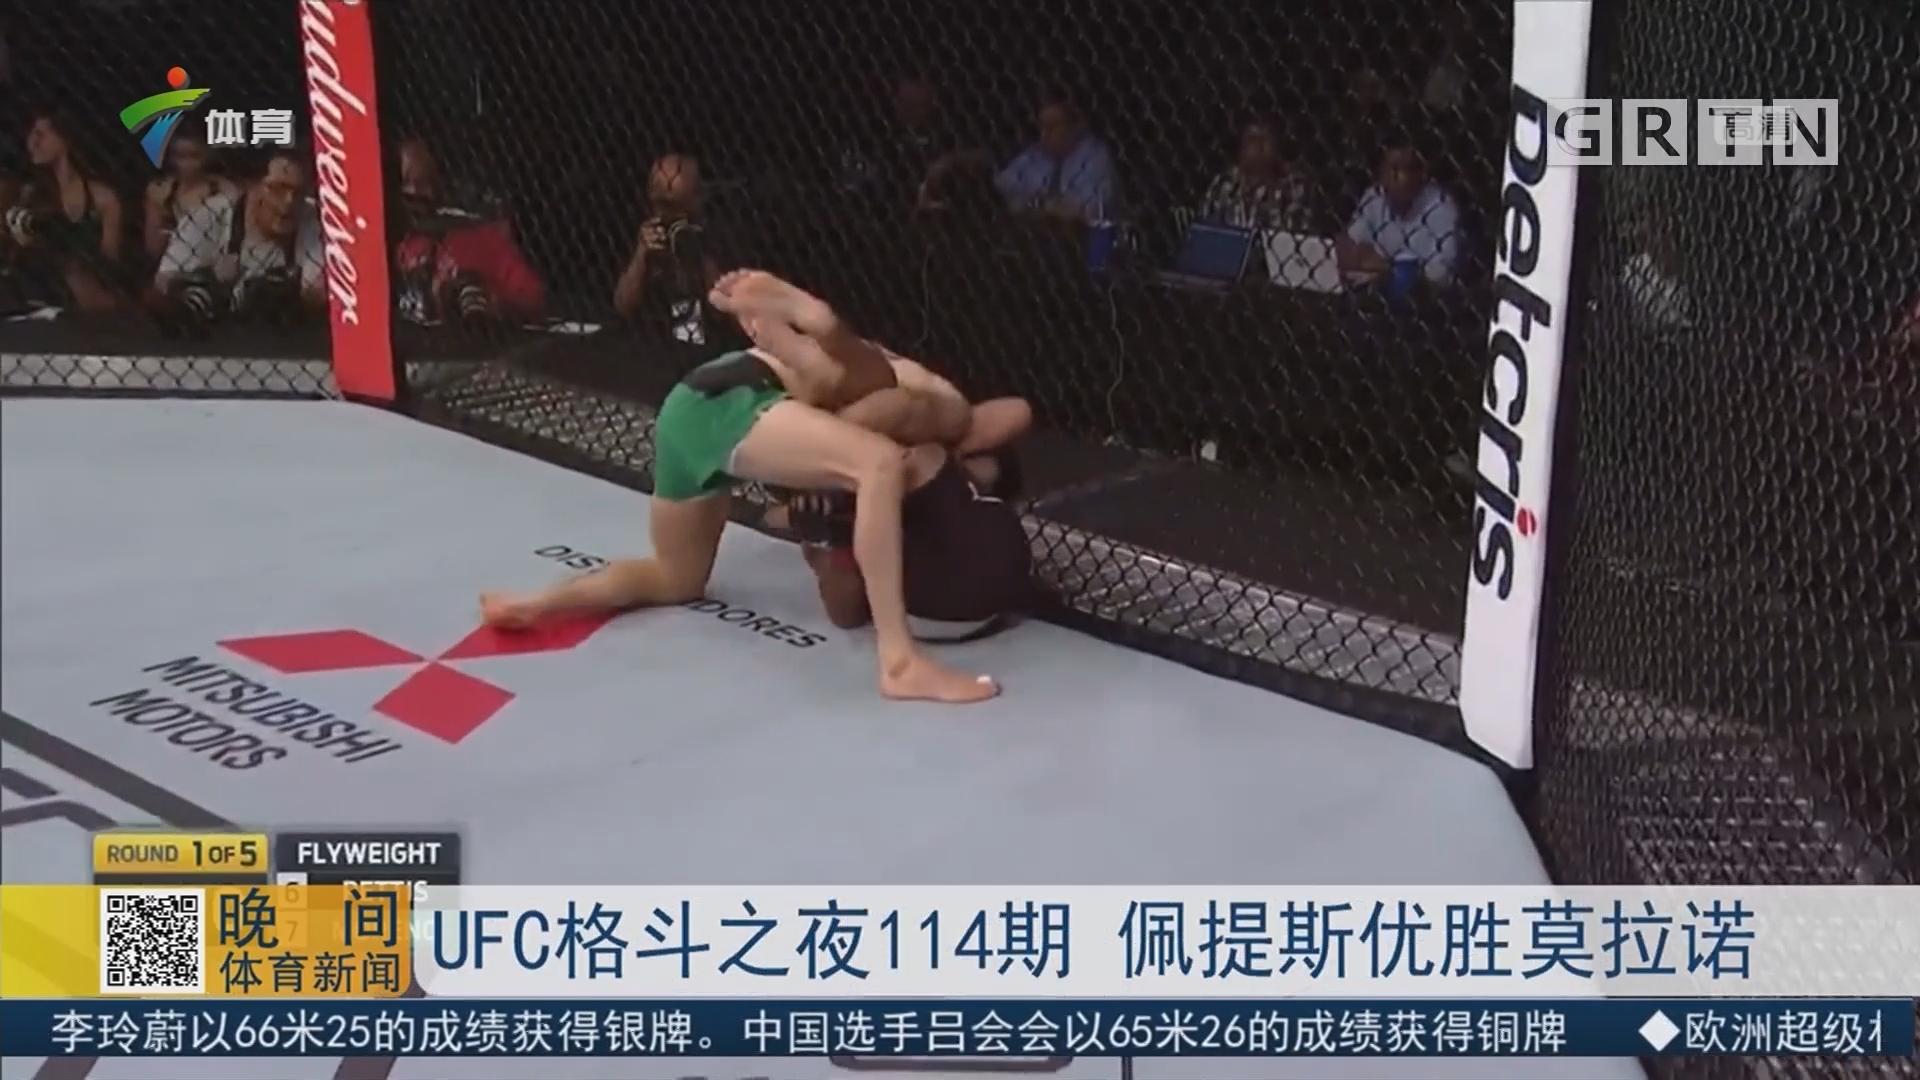 UFC格斗之夜114期 佩提斯优胜莫拉诺